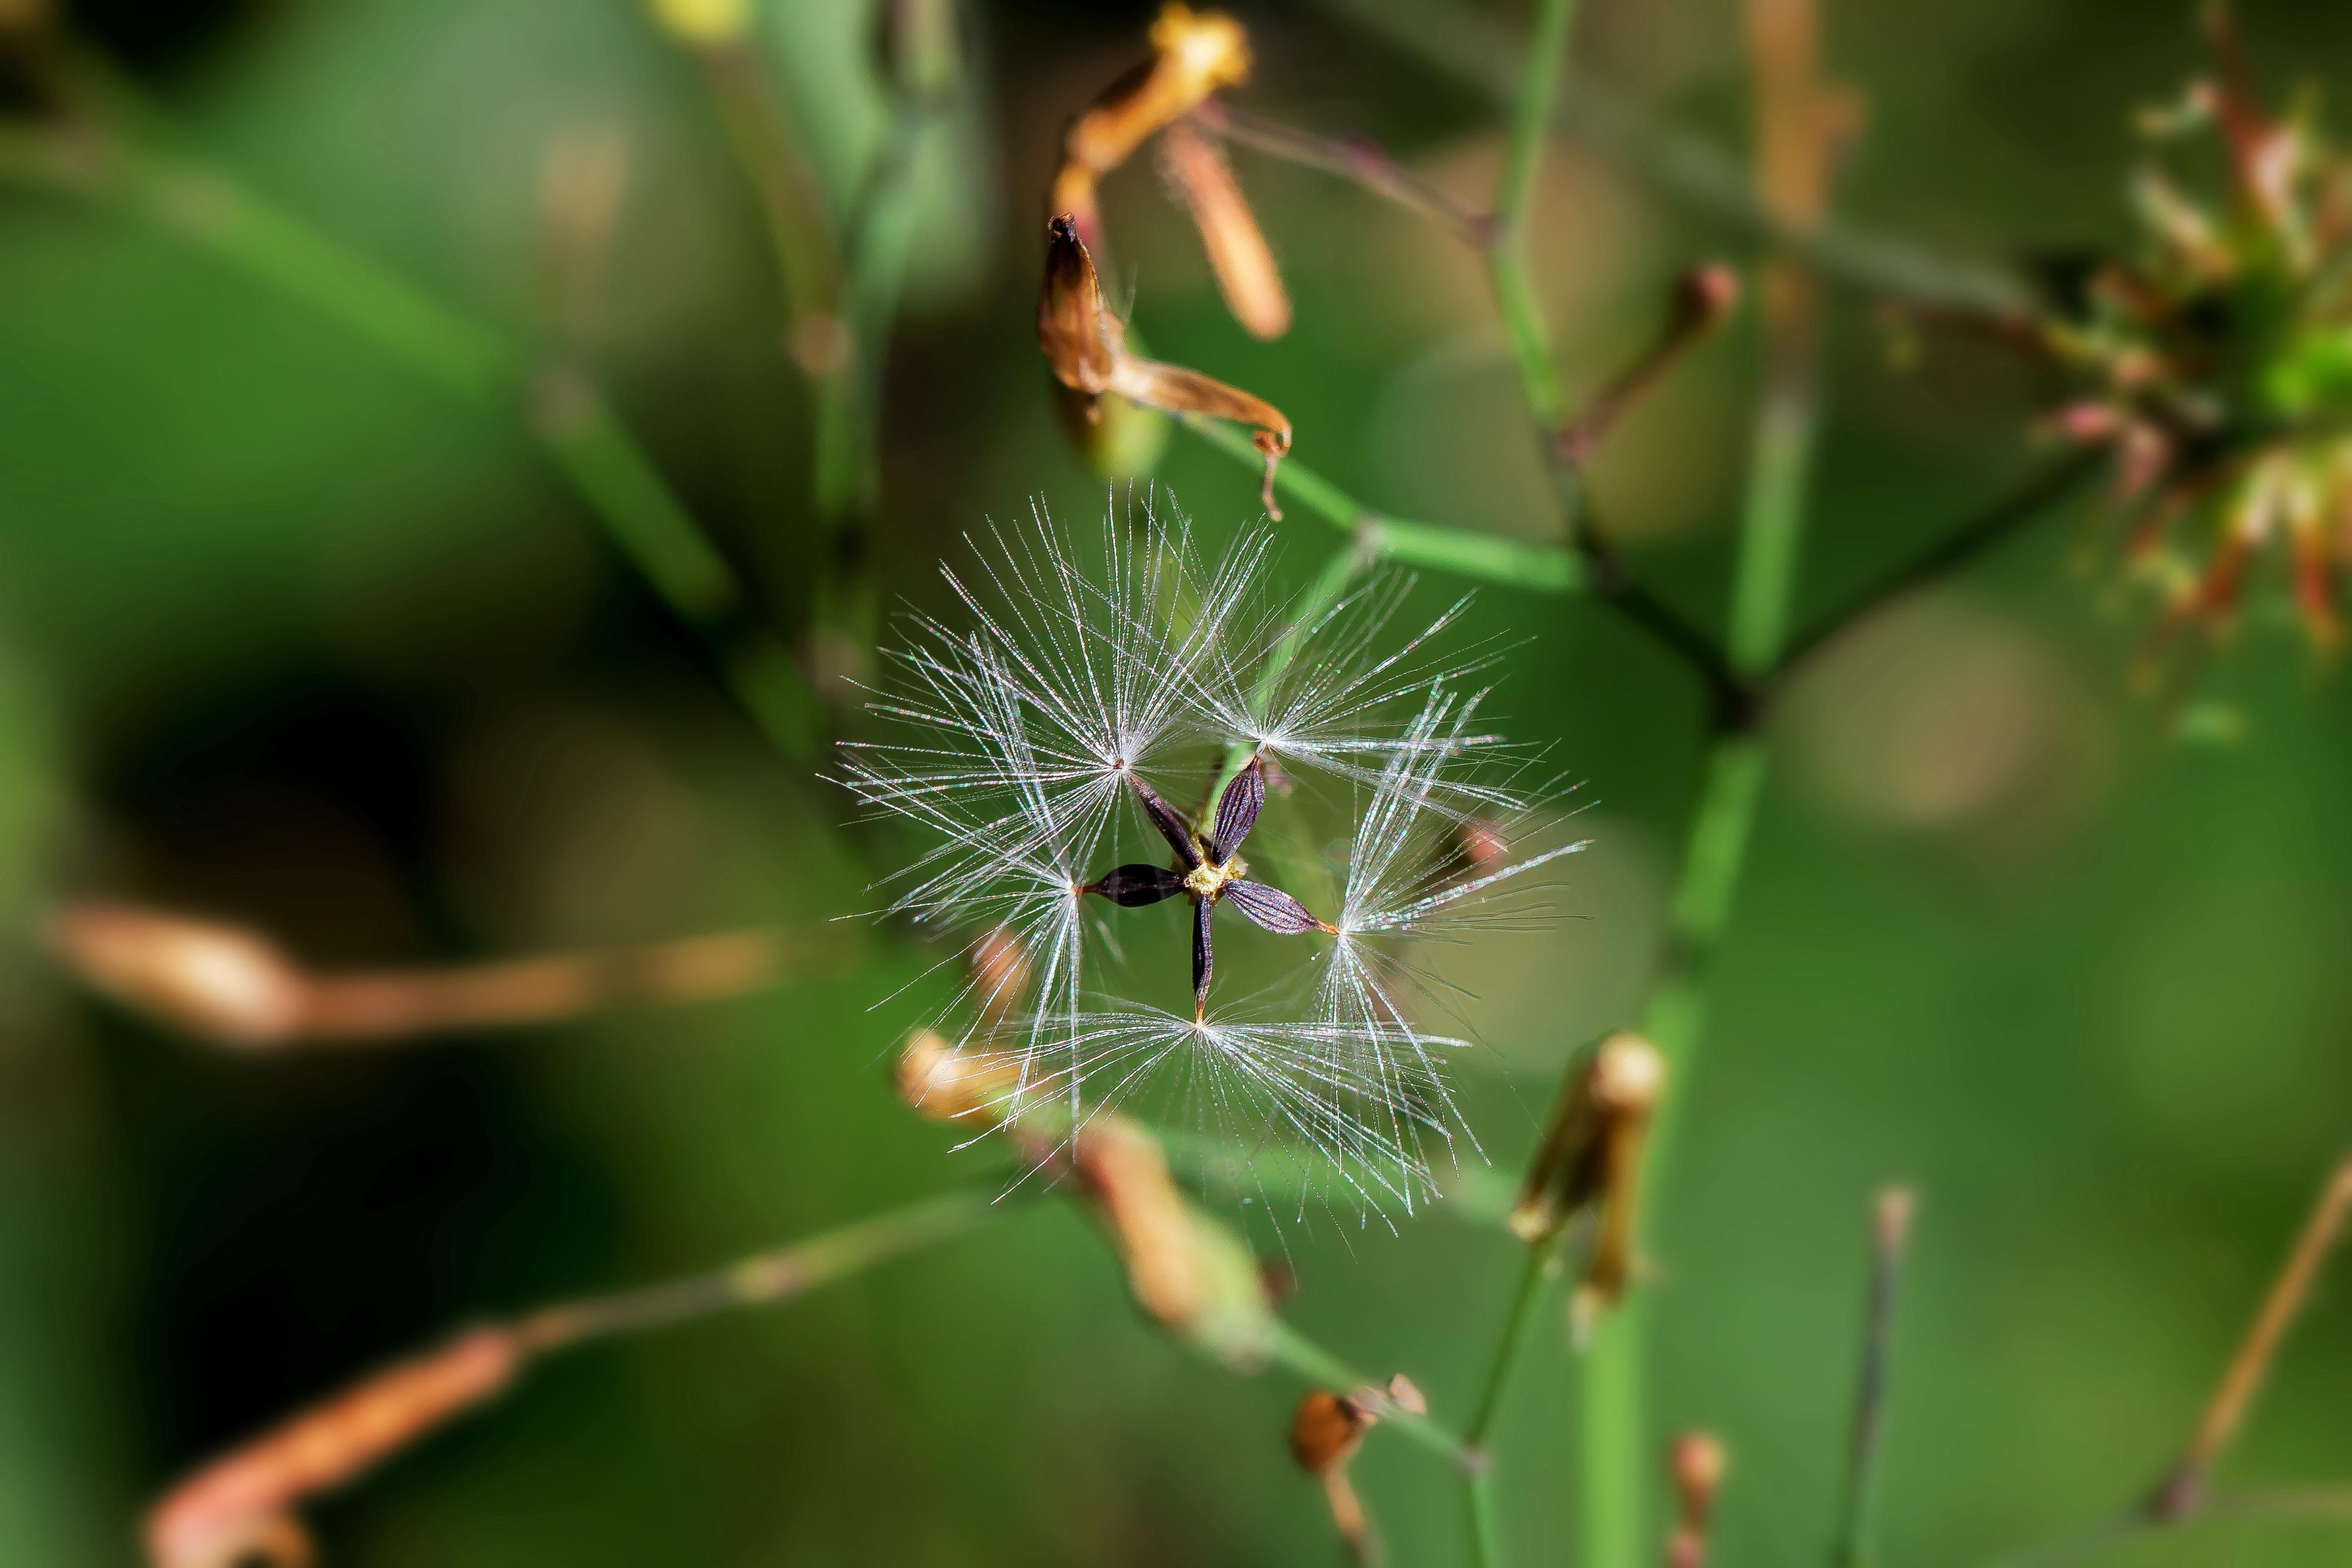 Unduh 95 Koleksi Gambar Flora Fauna Geometri Paling Bagus Gratis